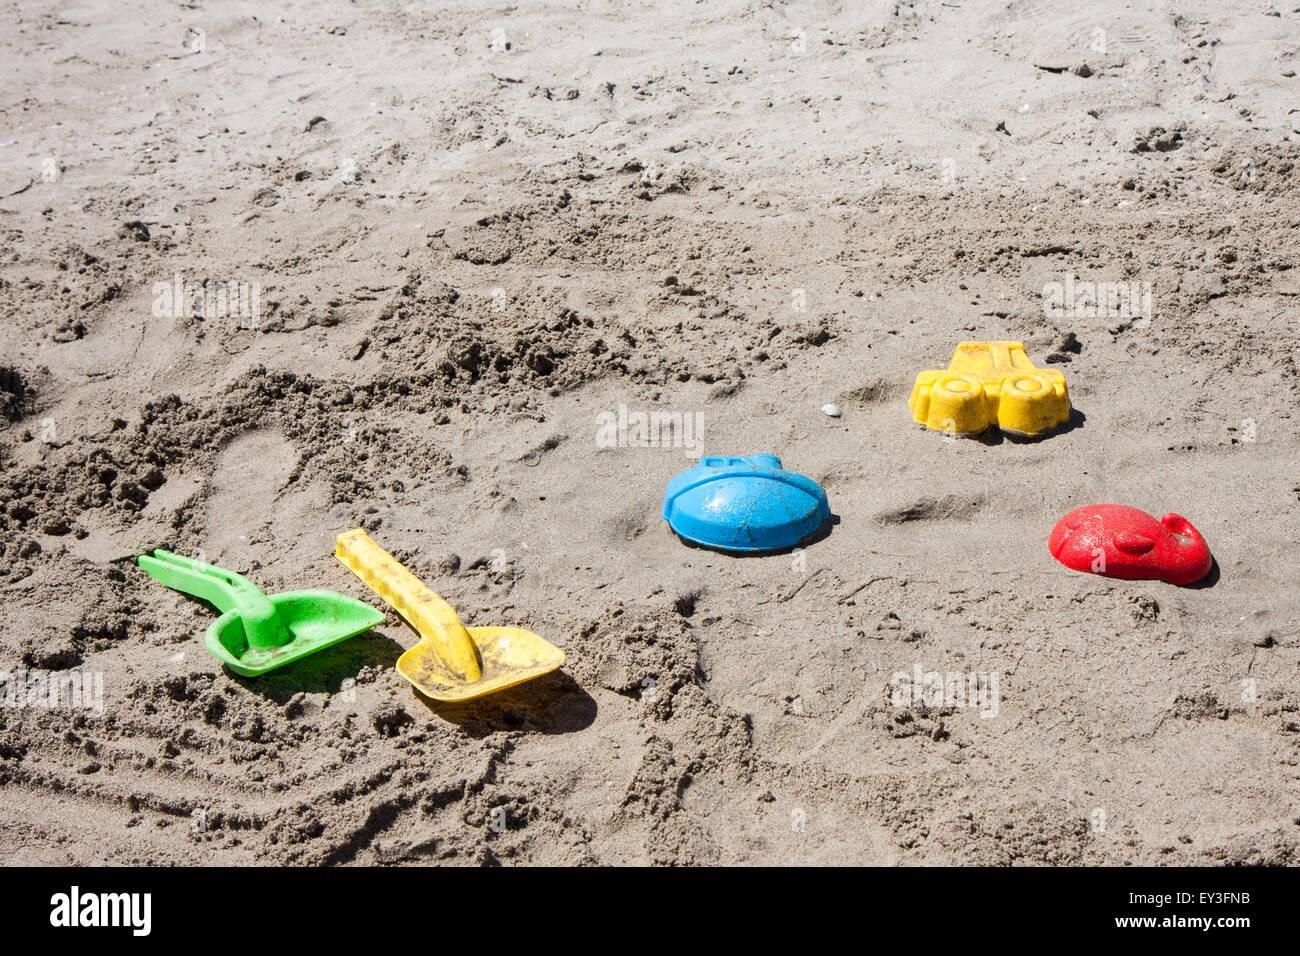 Toys italy stockfotos bilder alamy